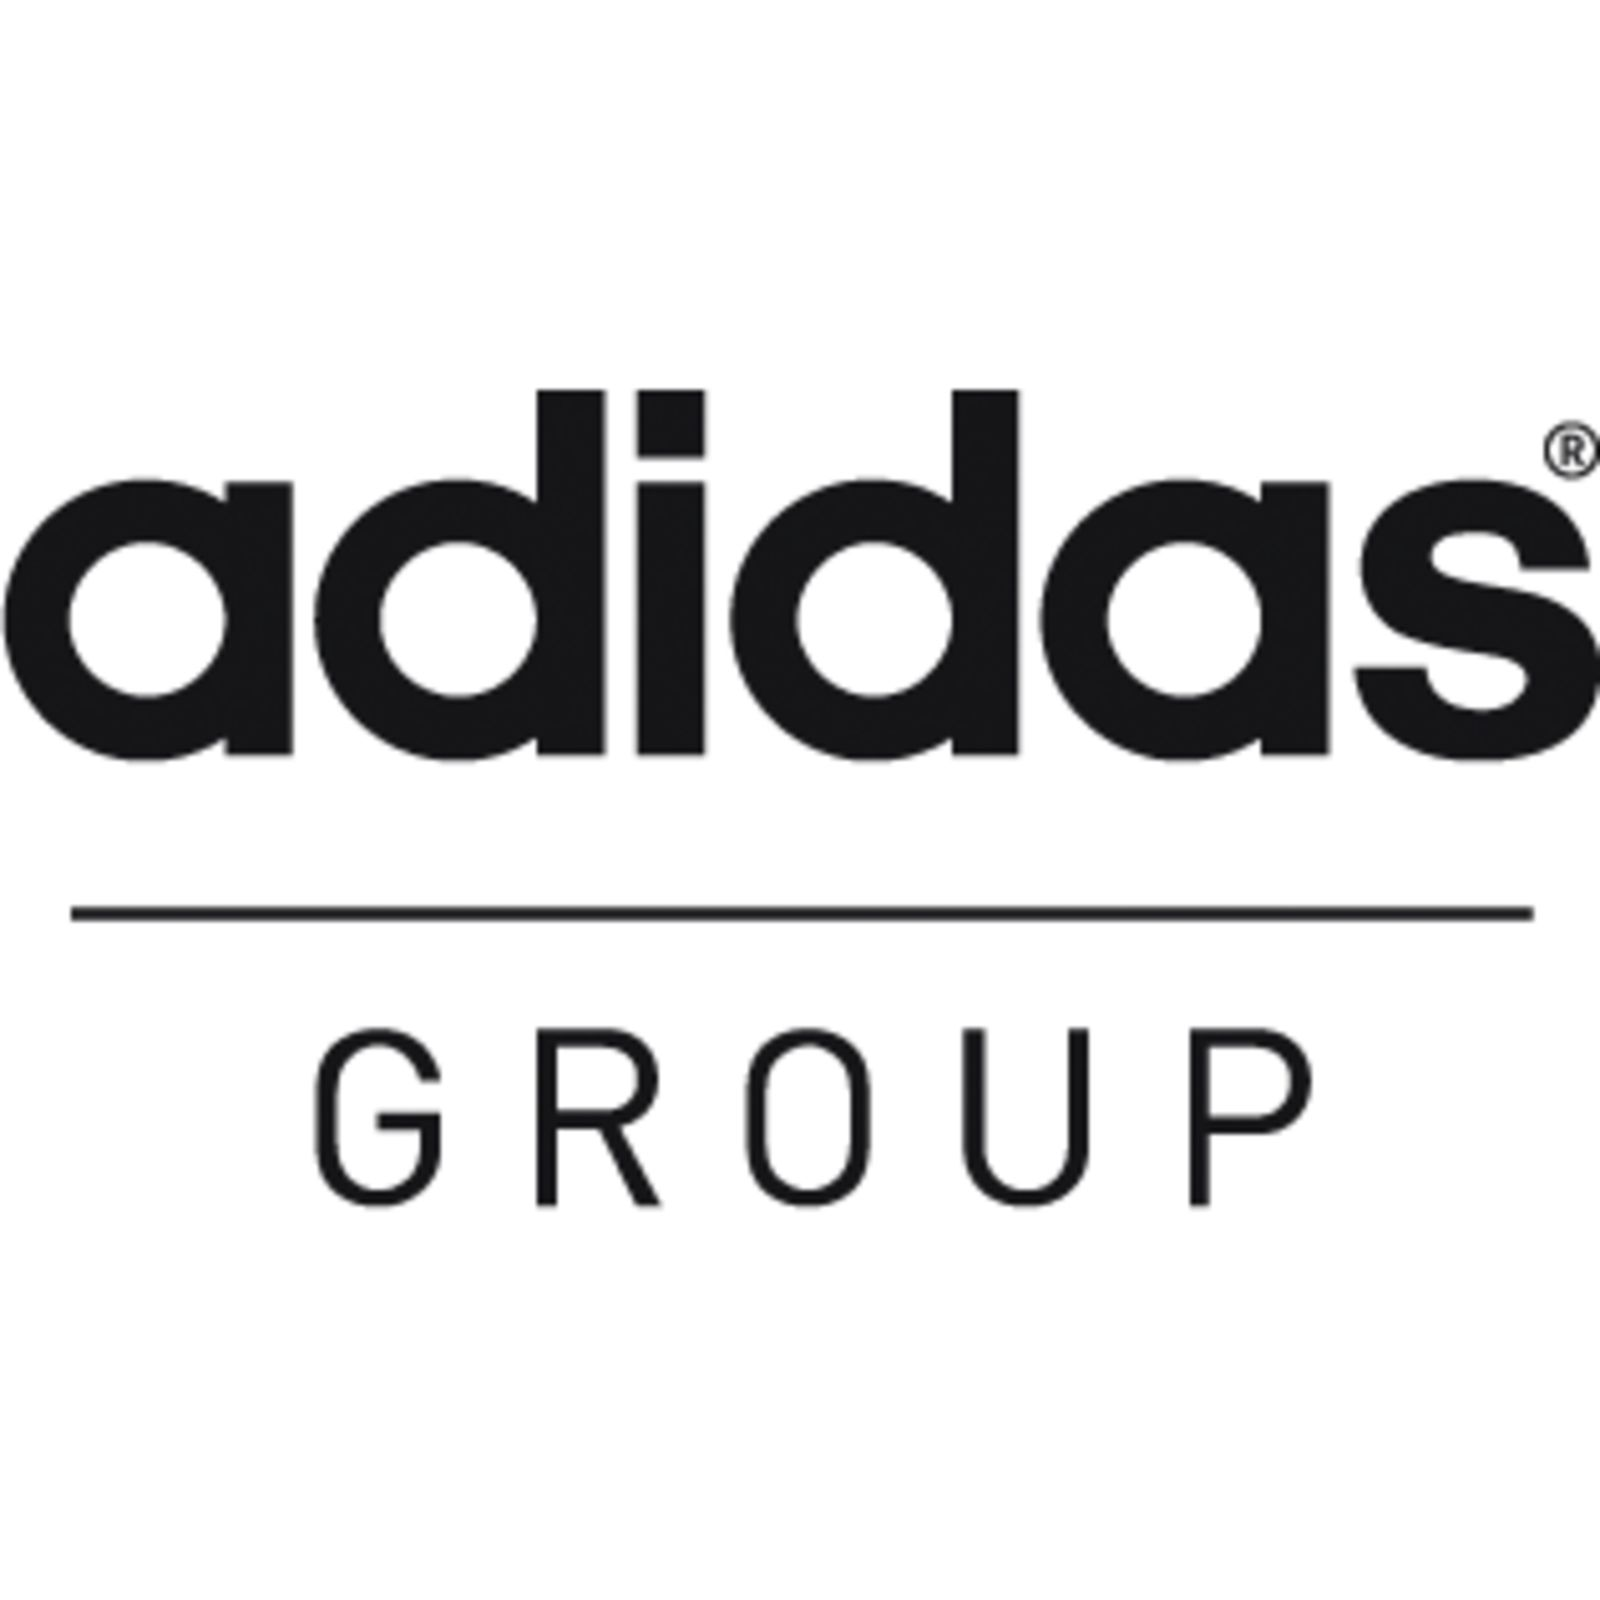 adidas (Image 1)